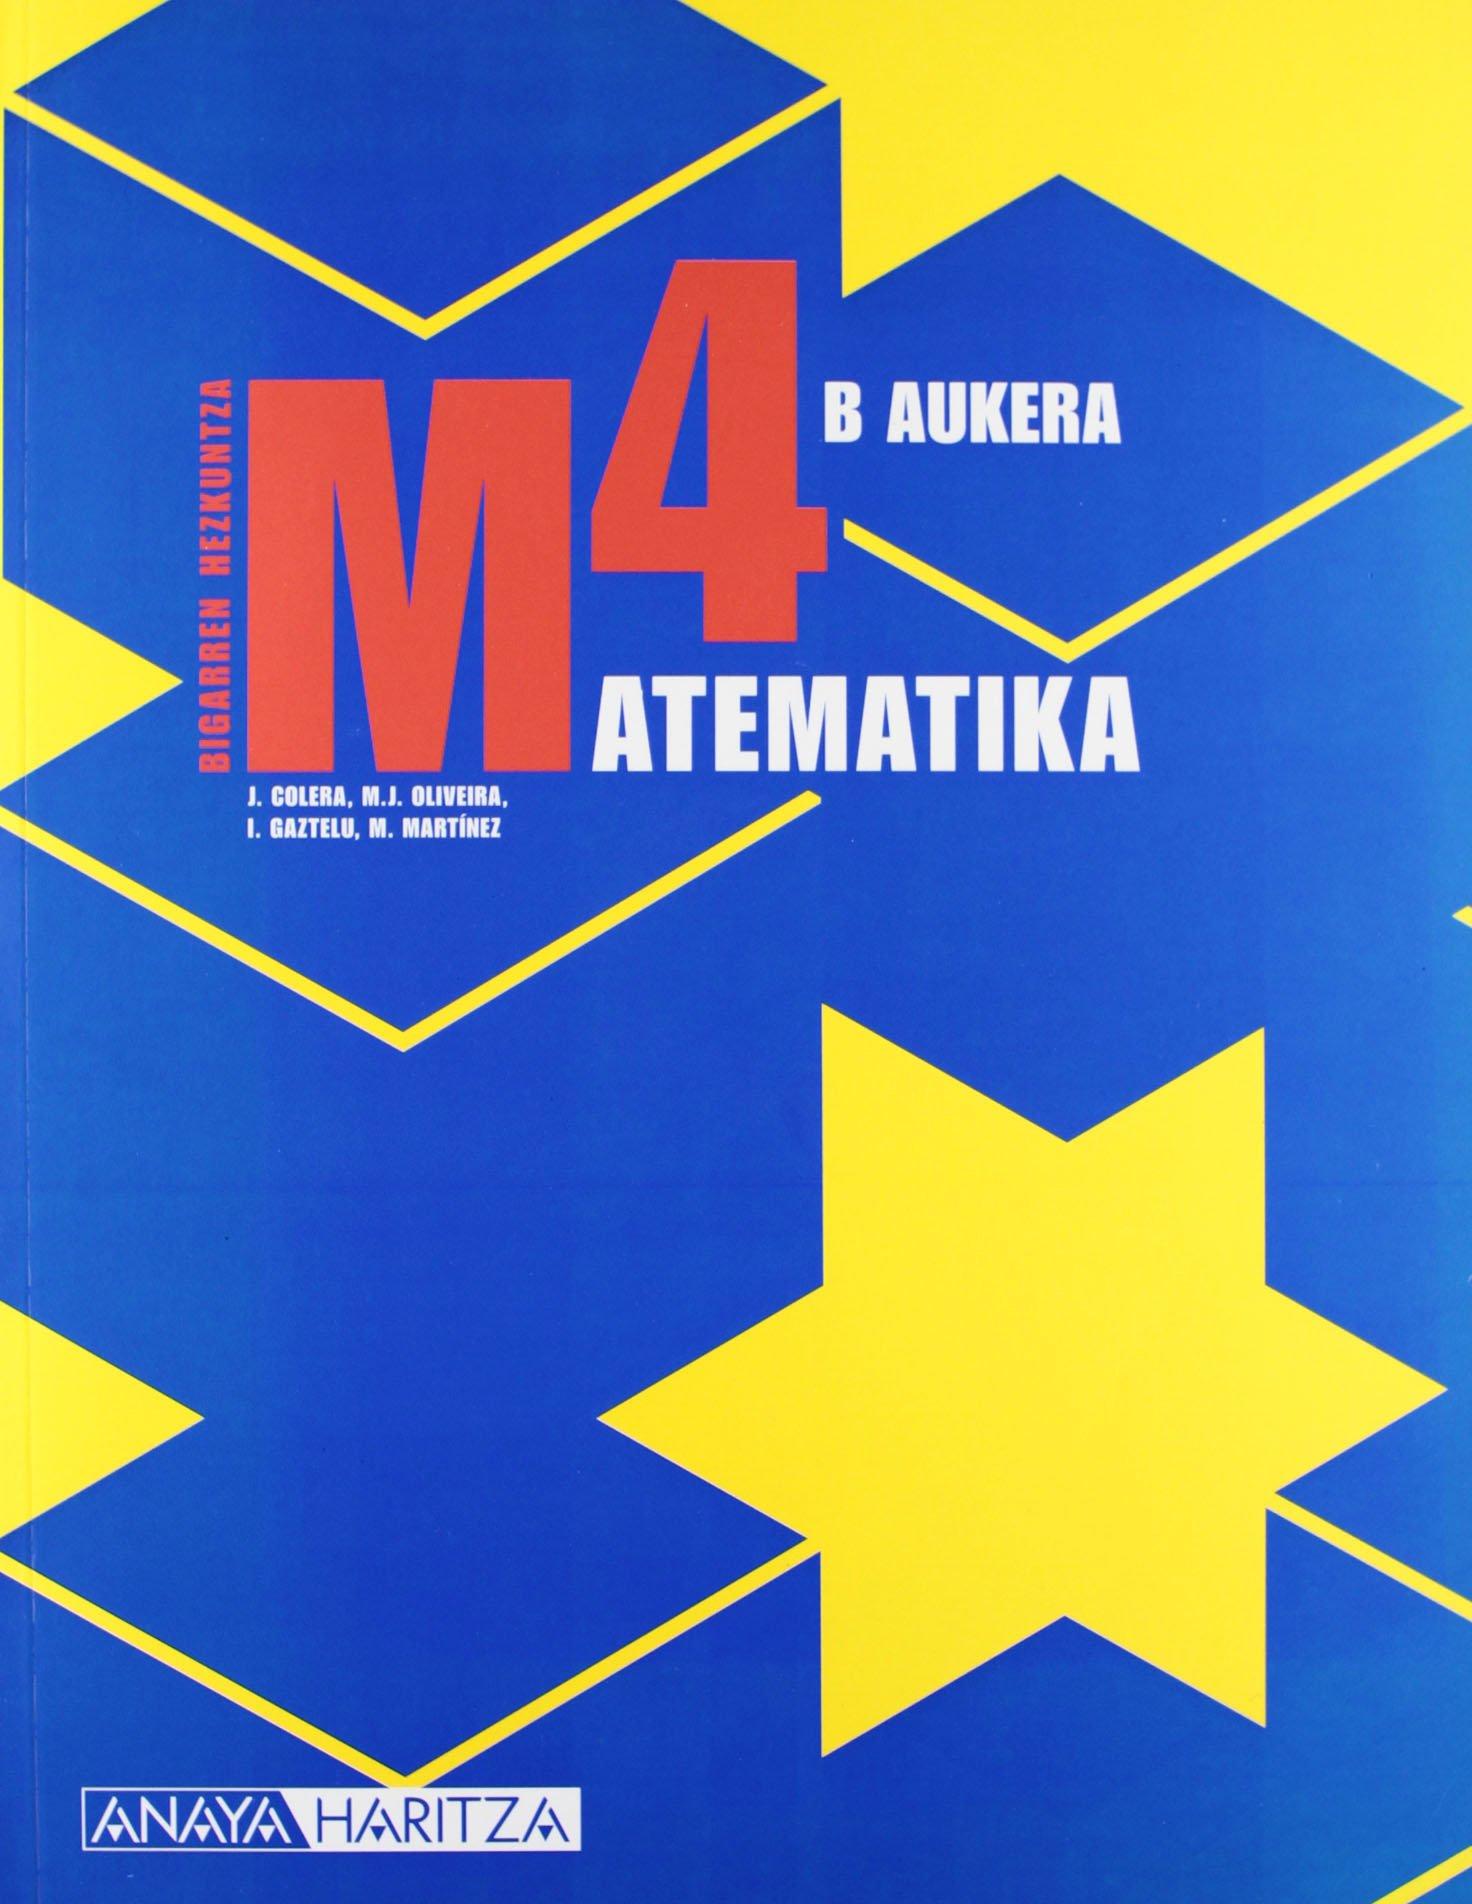 Read Online (EUS).(08).MATEMATIKA 4ºESO.DBH.(OPC.B).AUKERA pdf epub